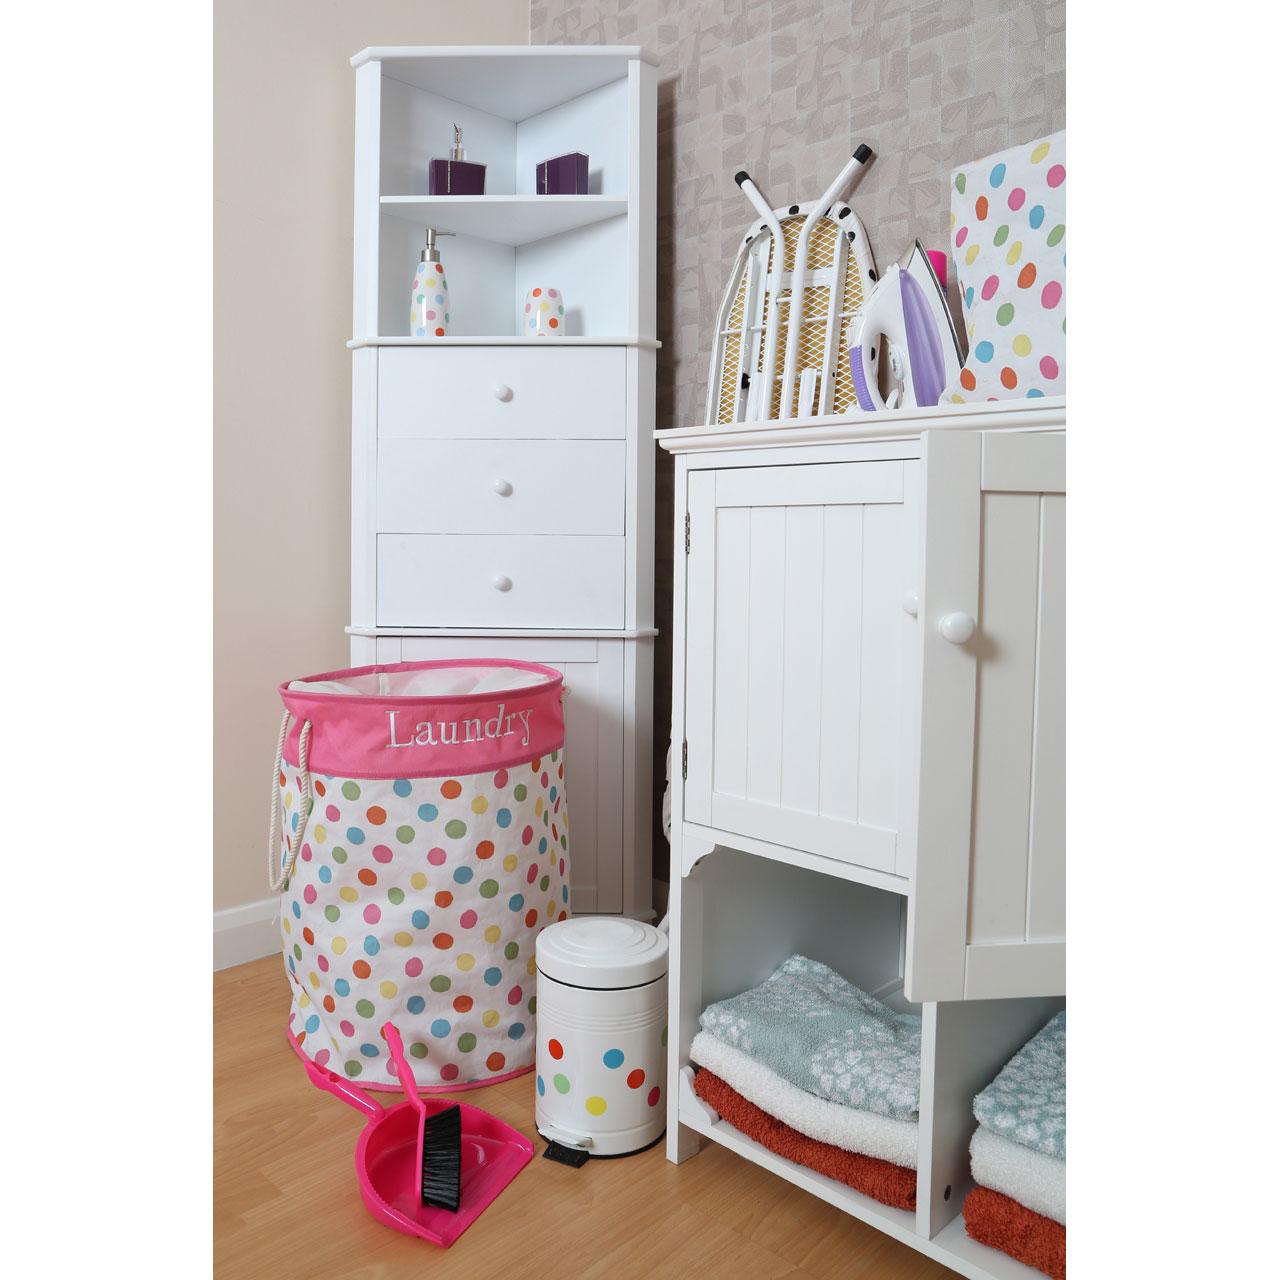 Dining Room Storage Ideas To Keep Your Scheme Clutter Free: Premier Housewares Corner Storage Unit, White Finish Wood